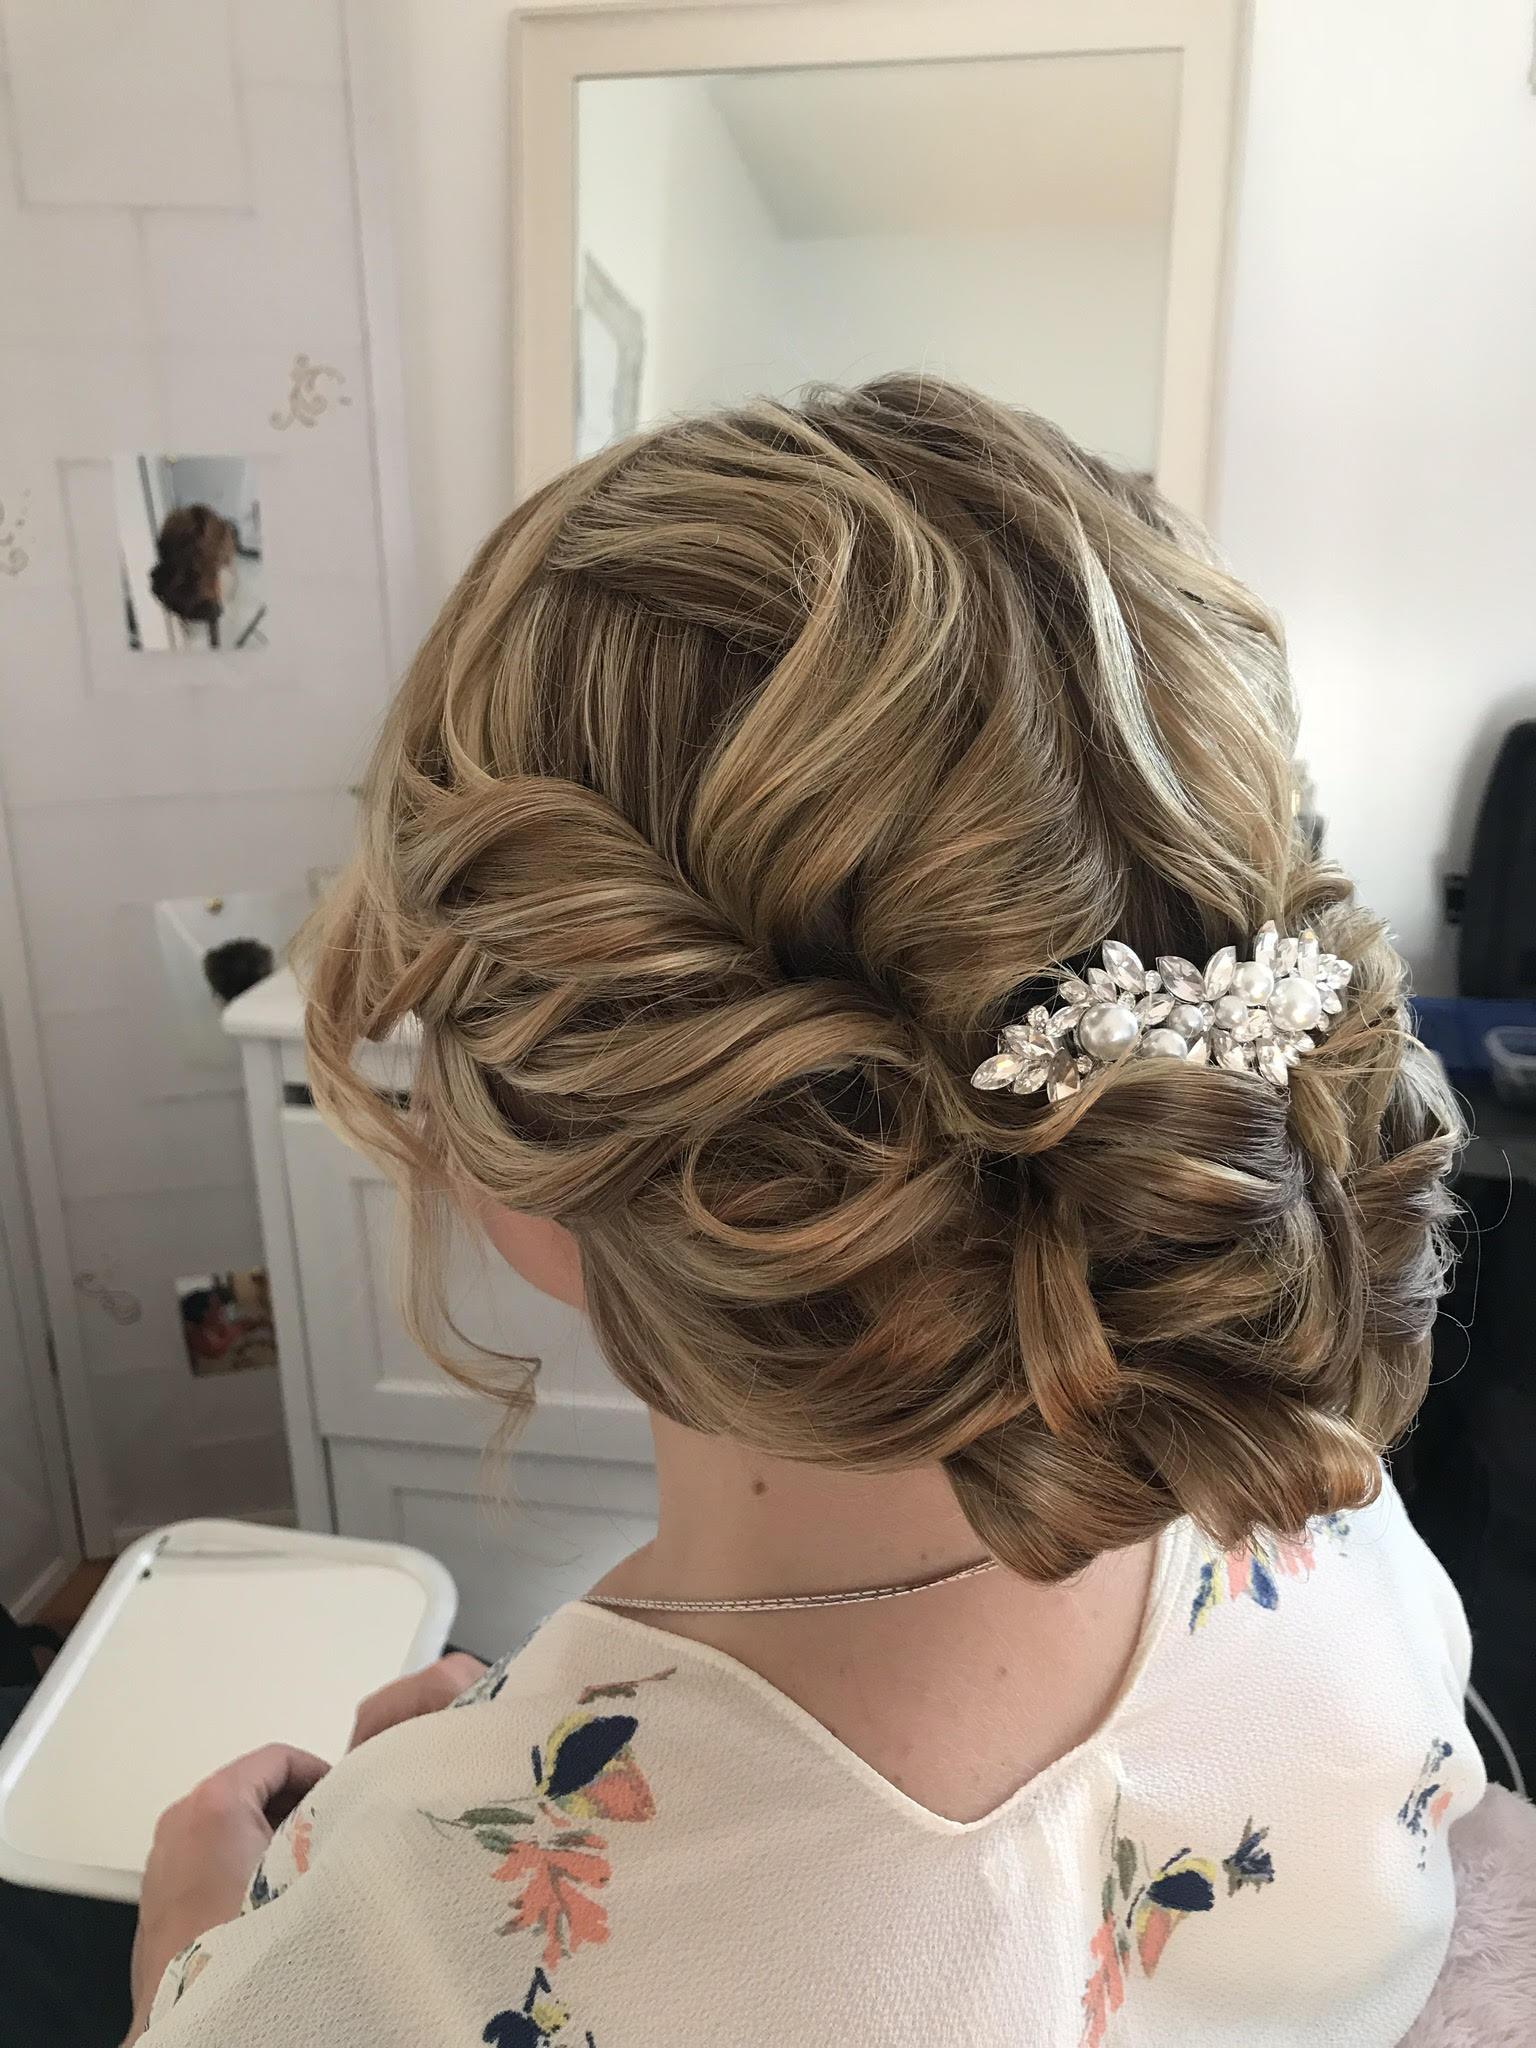 Ziel Bridal Bride Hair Style.jpg